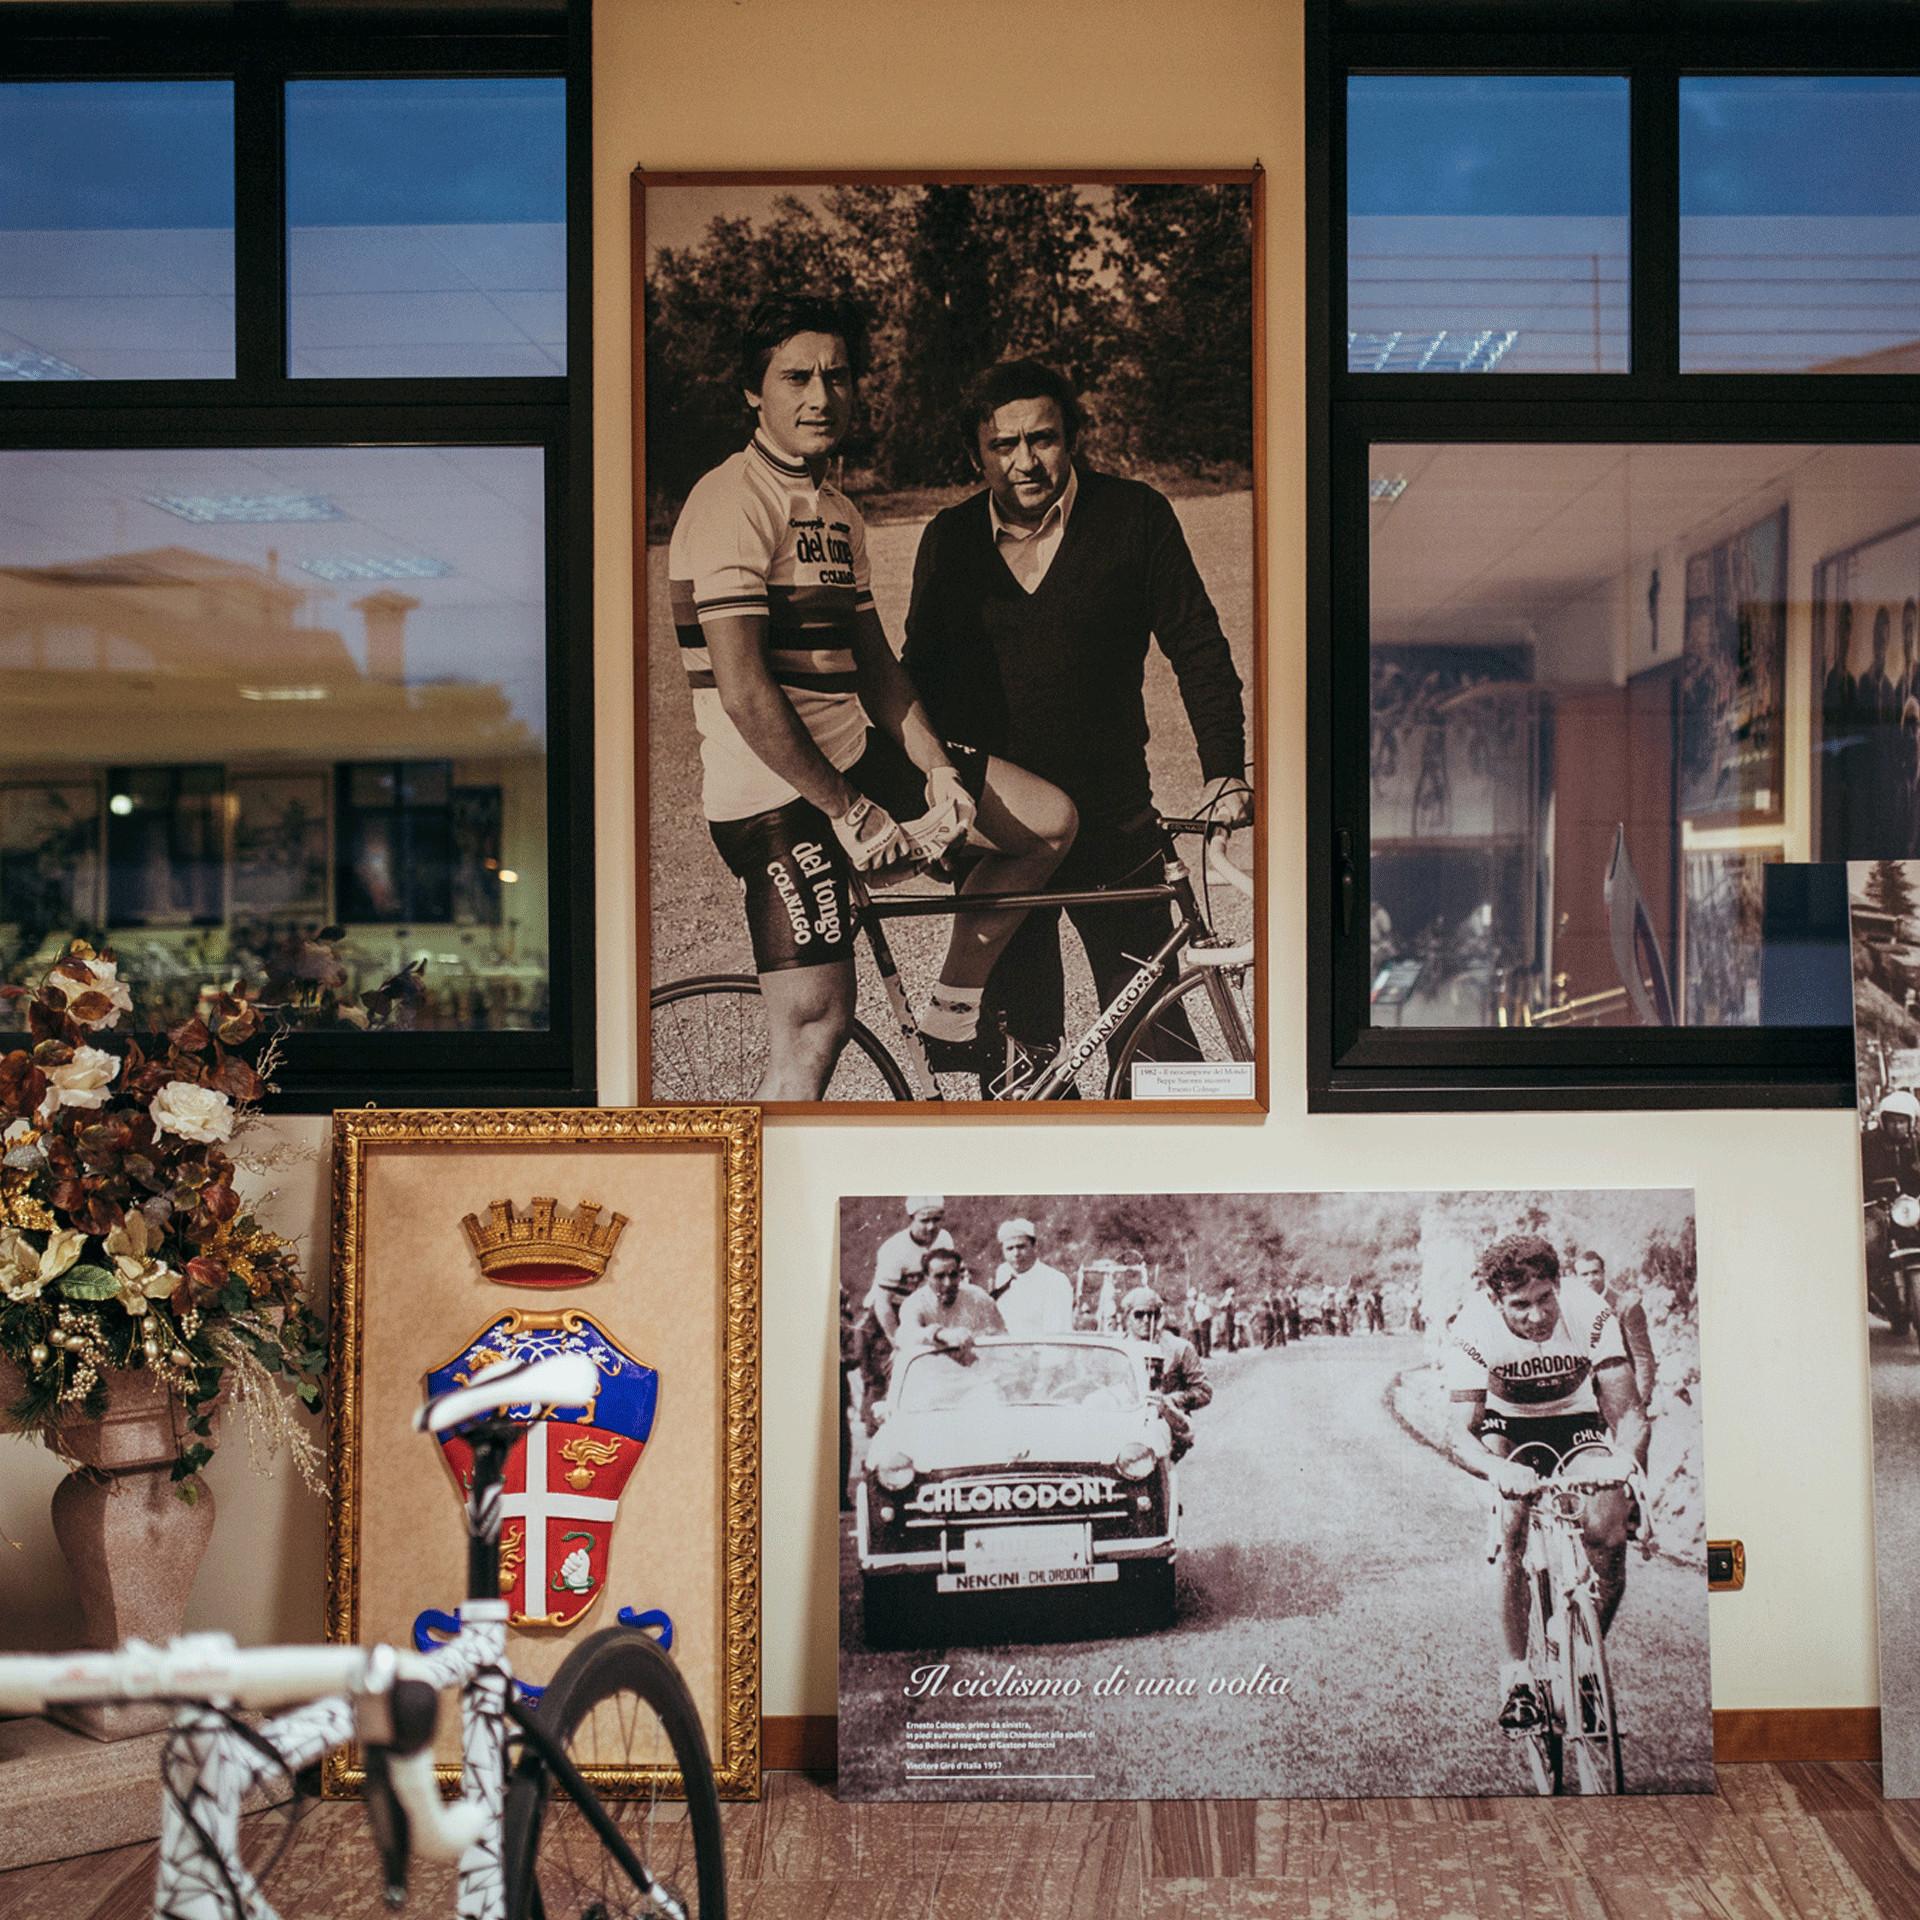 Colnago riders